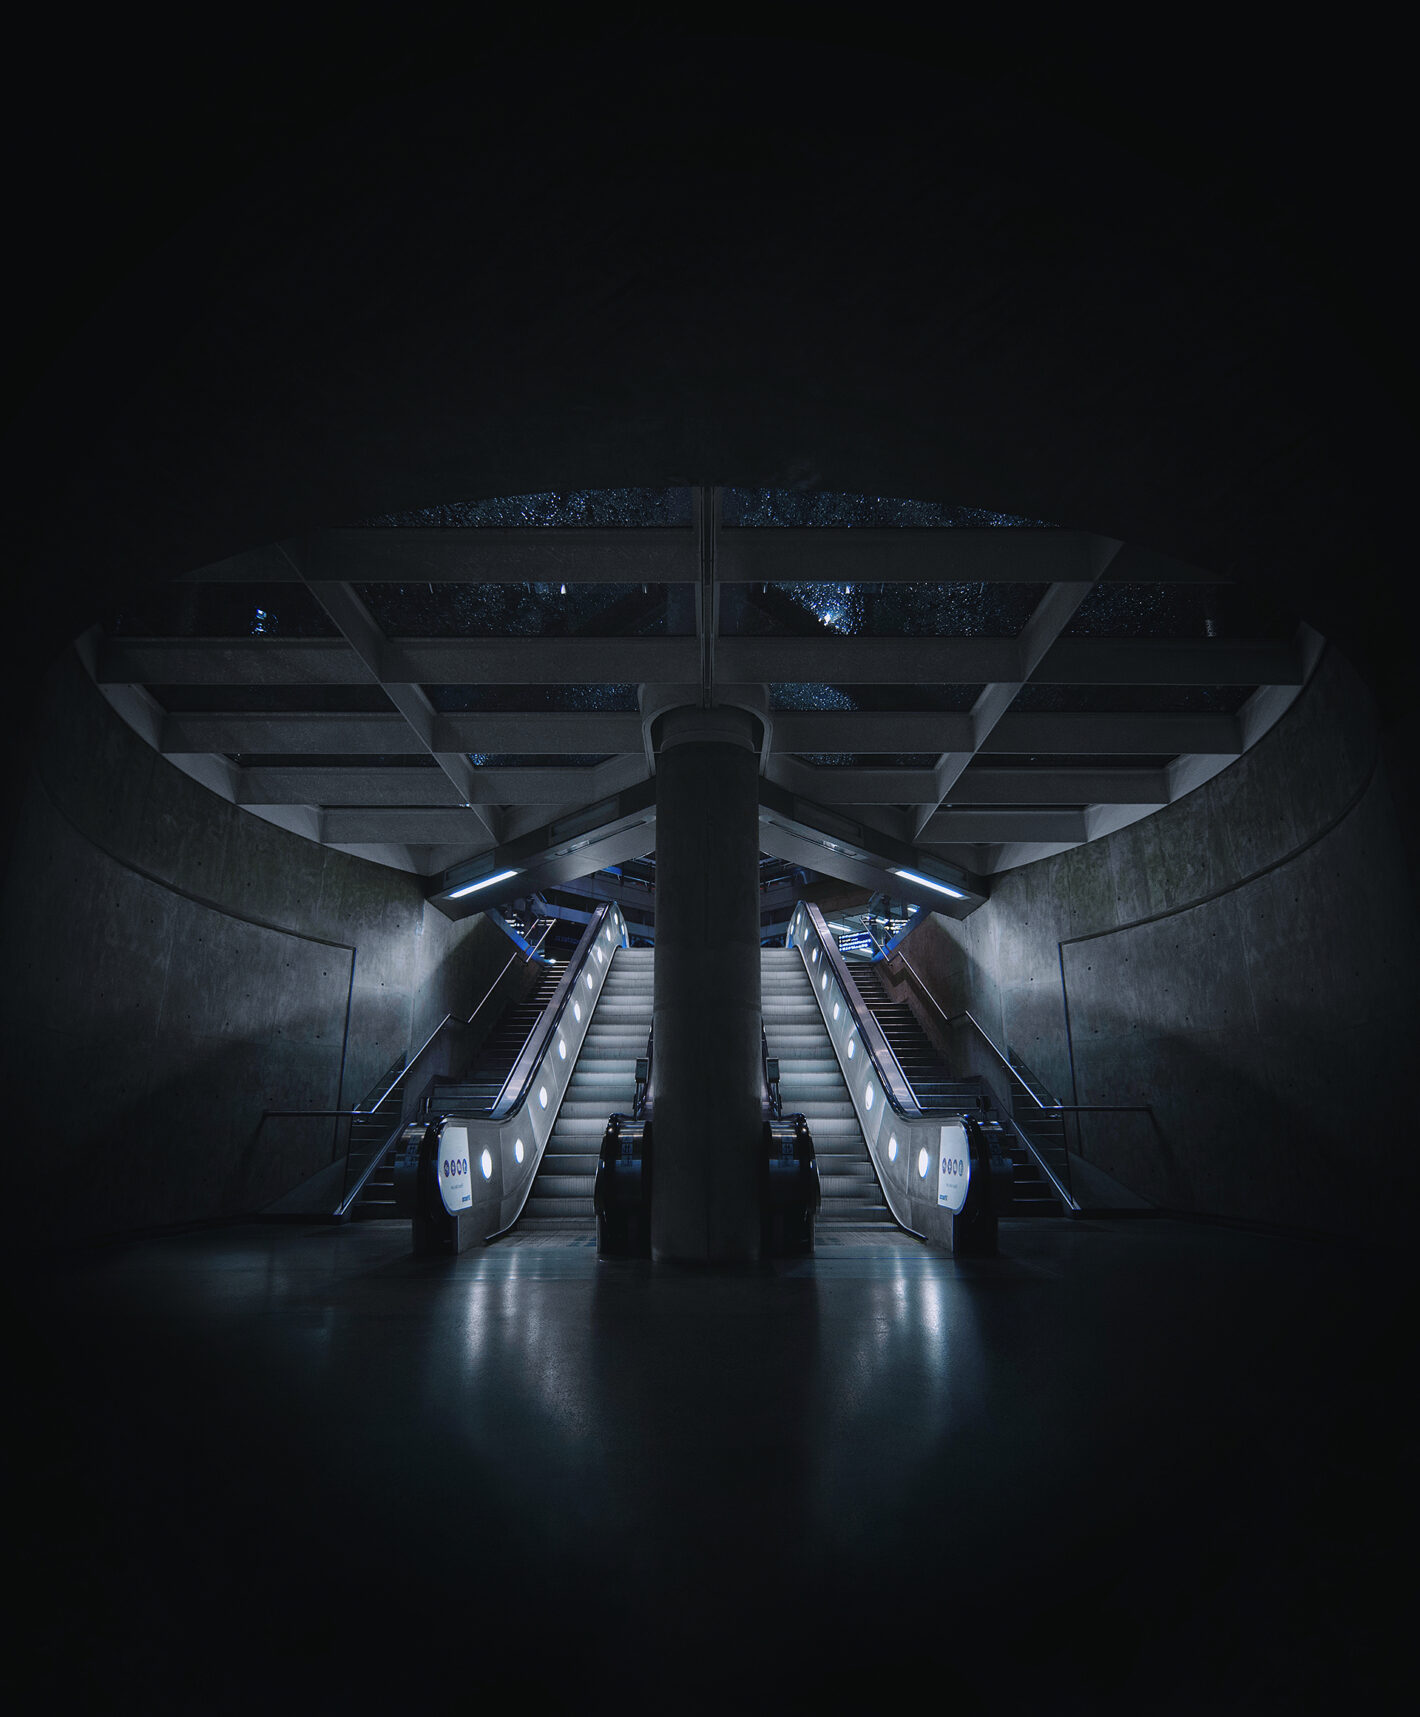 Les clichés futuristes de l'architecture du métro londonien de Max Vassiades